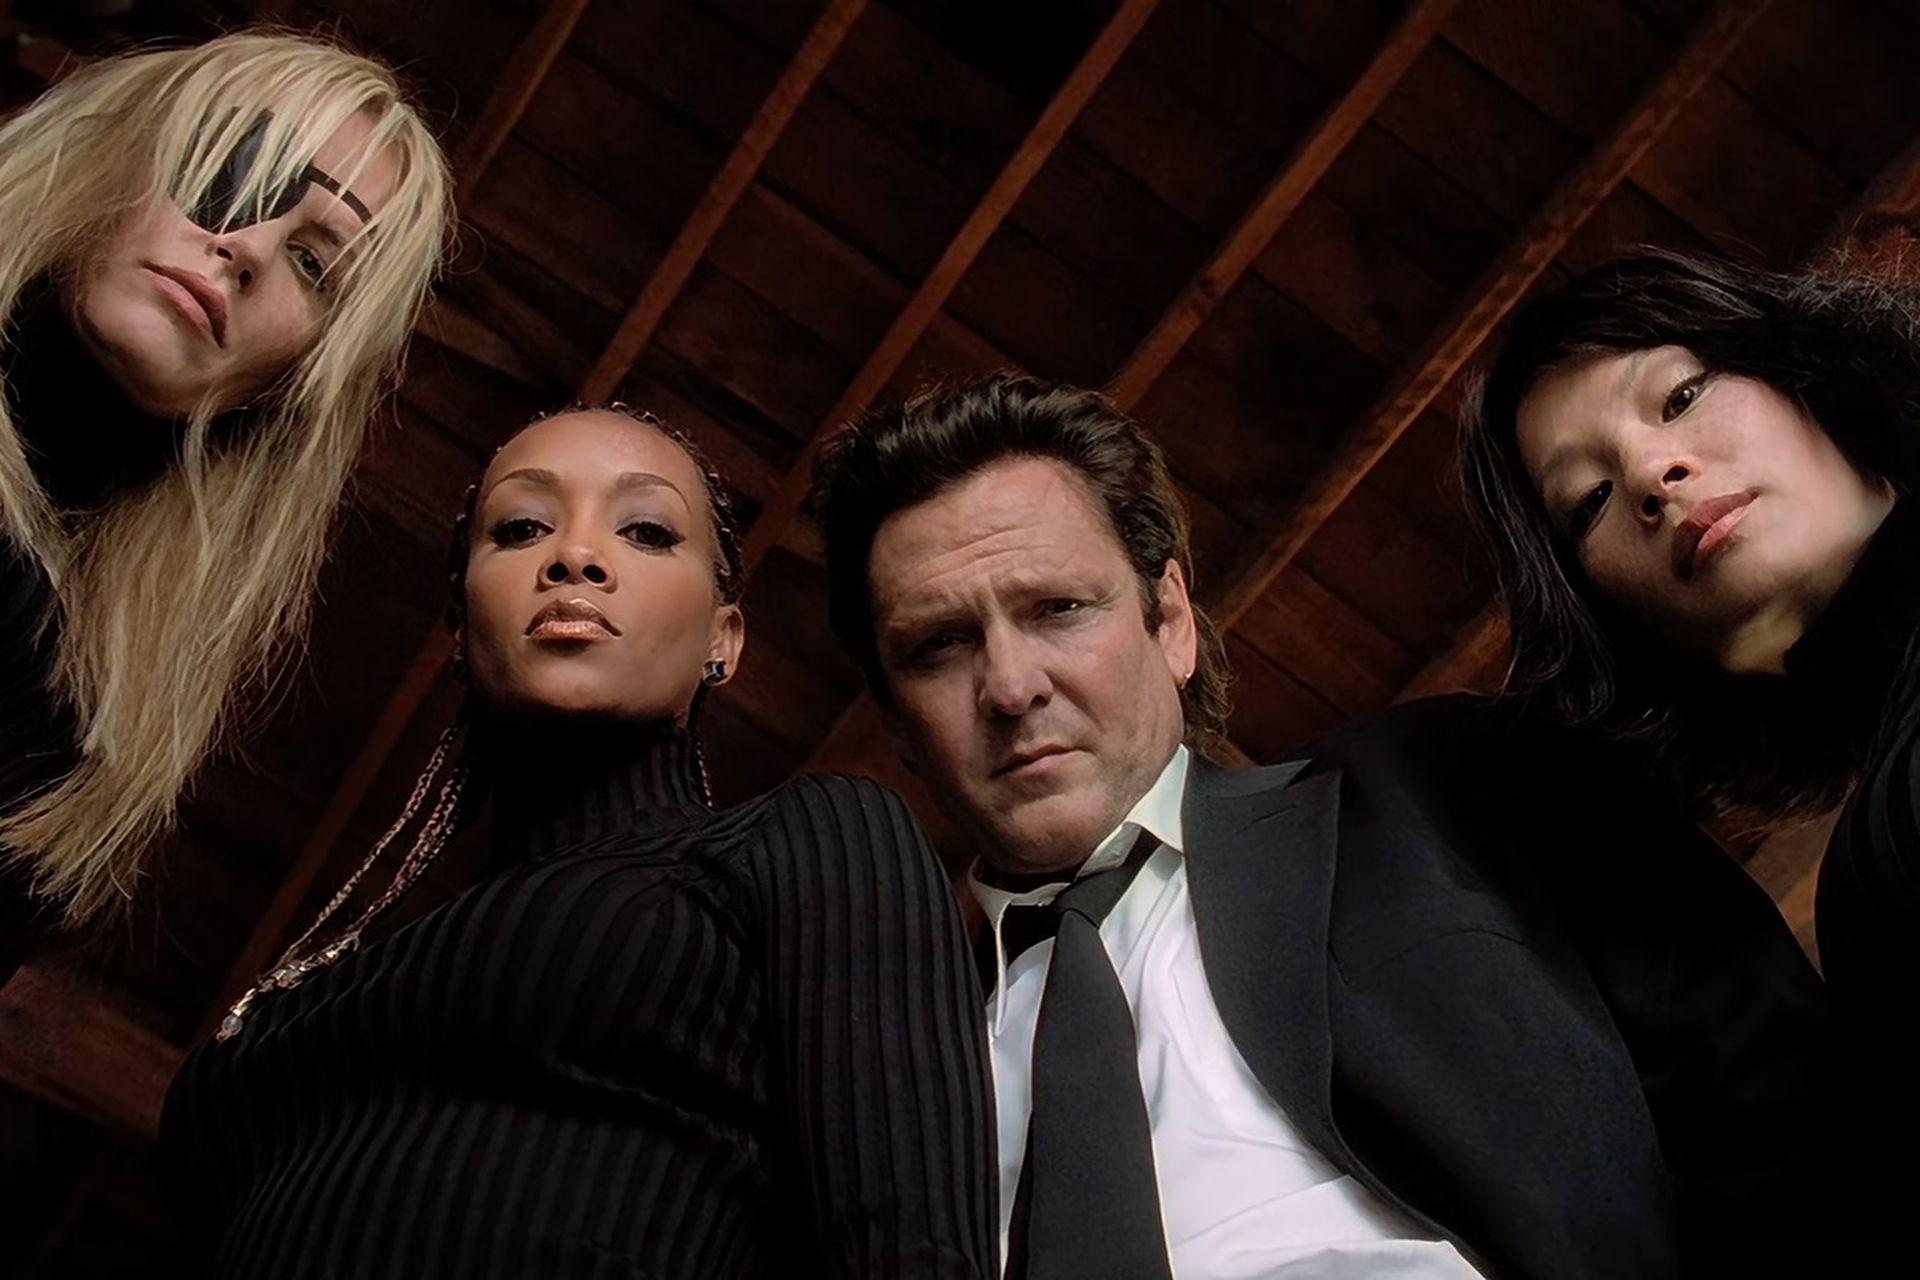 Daryl Hannah, Vivica A. Fox, Michael Madsen y Lucy Liu, villanos de Kill Bill